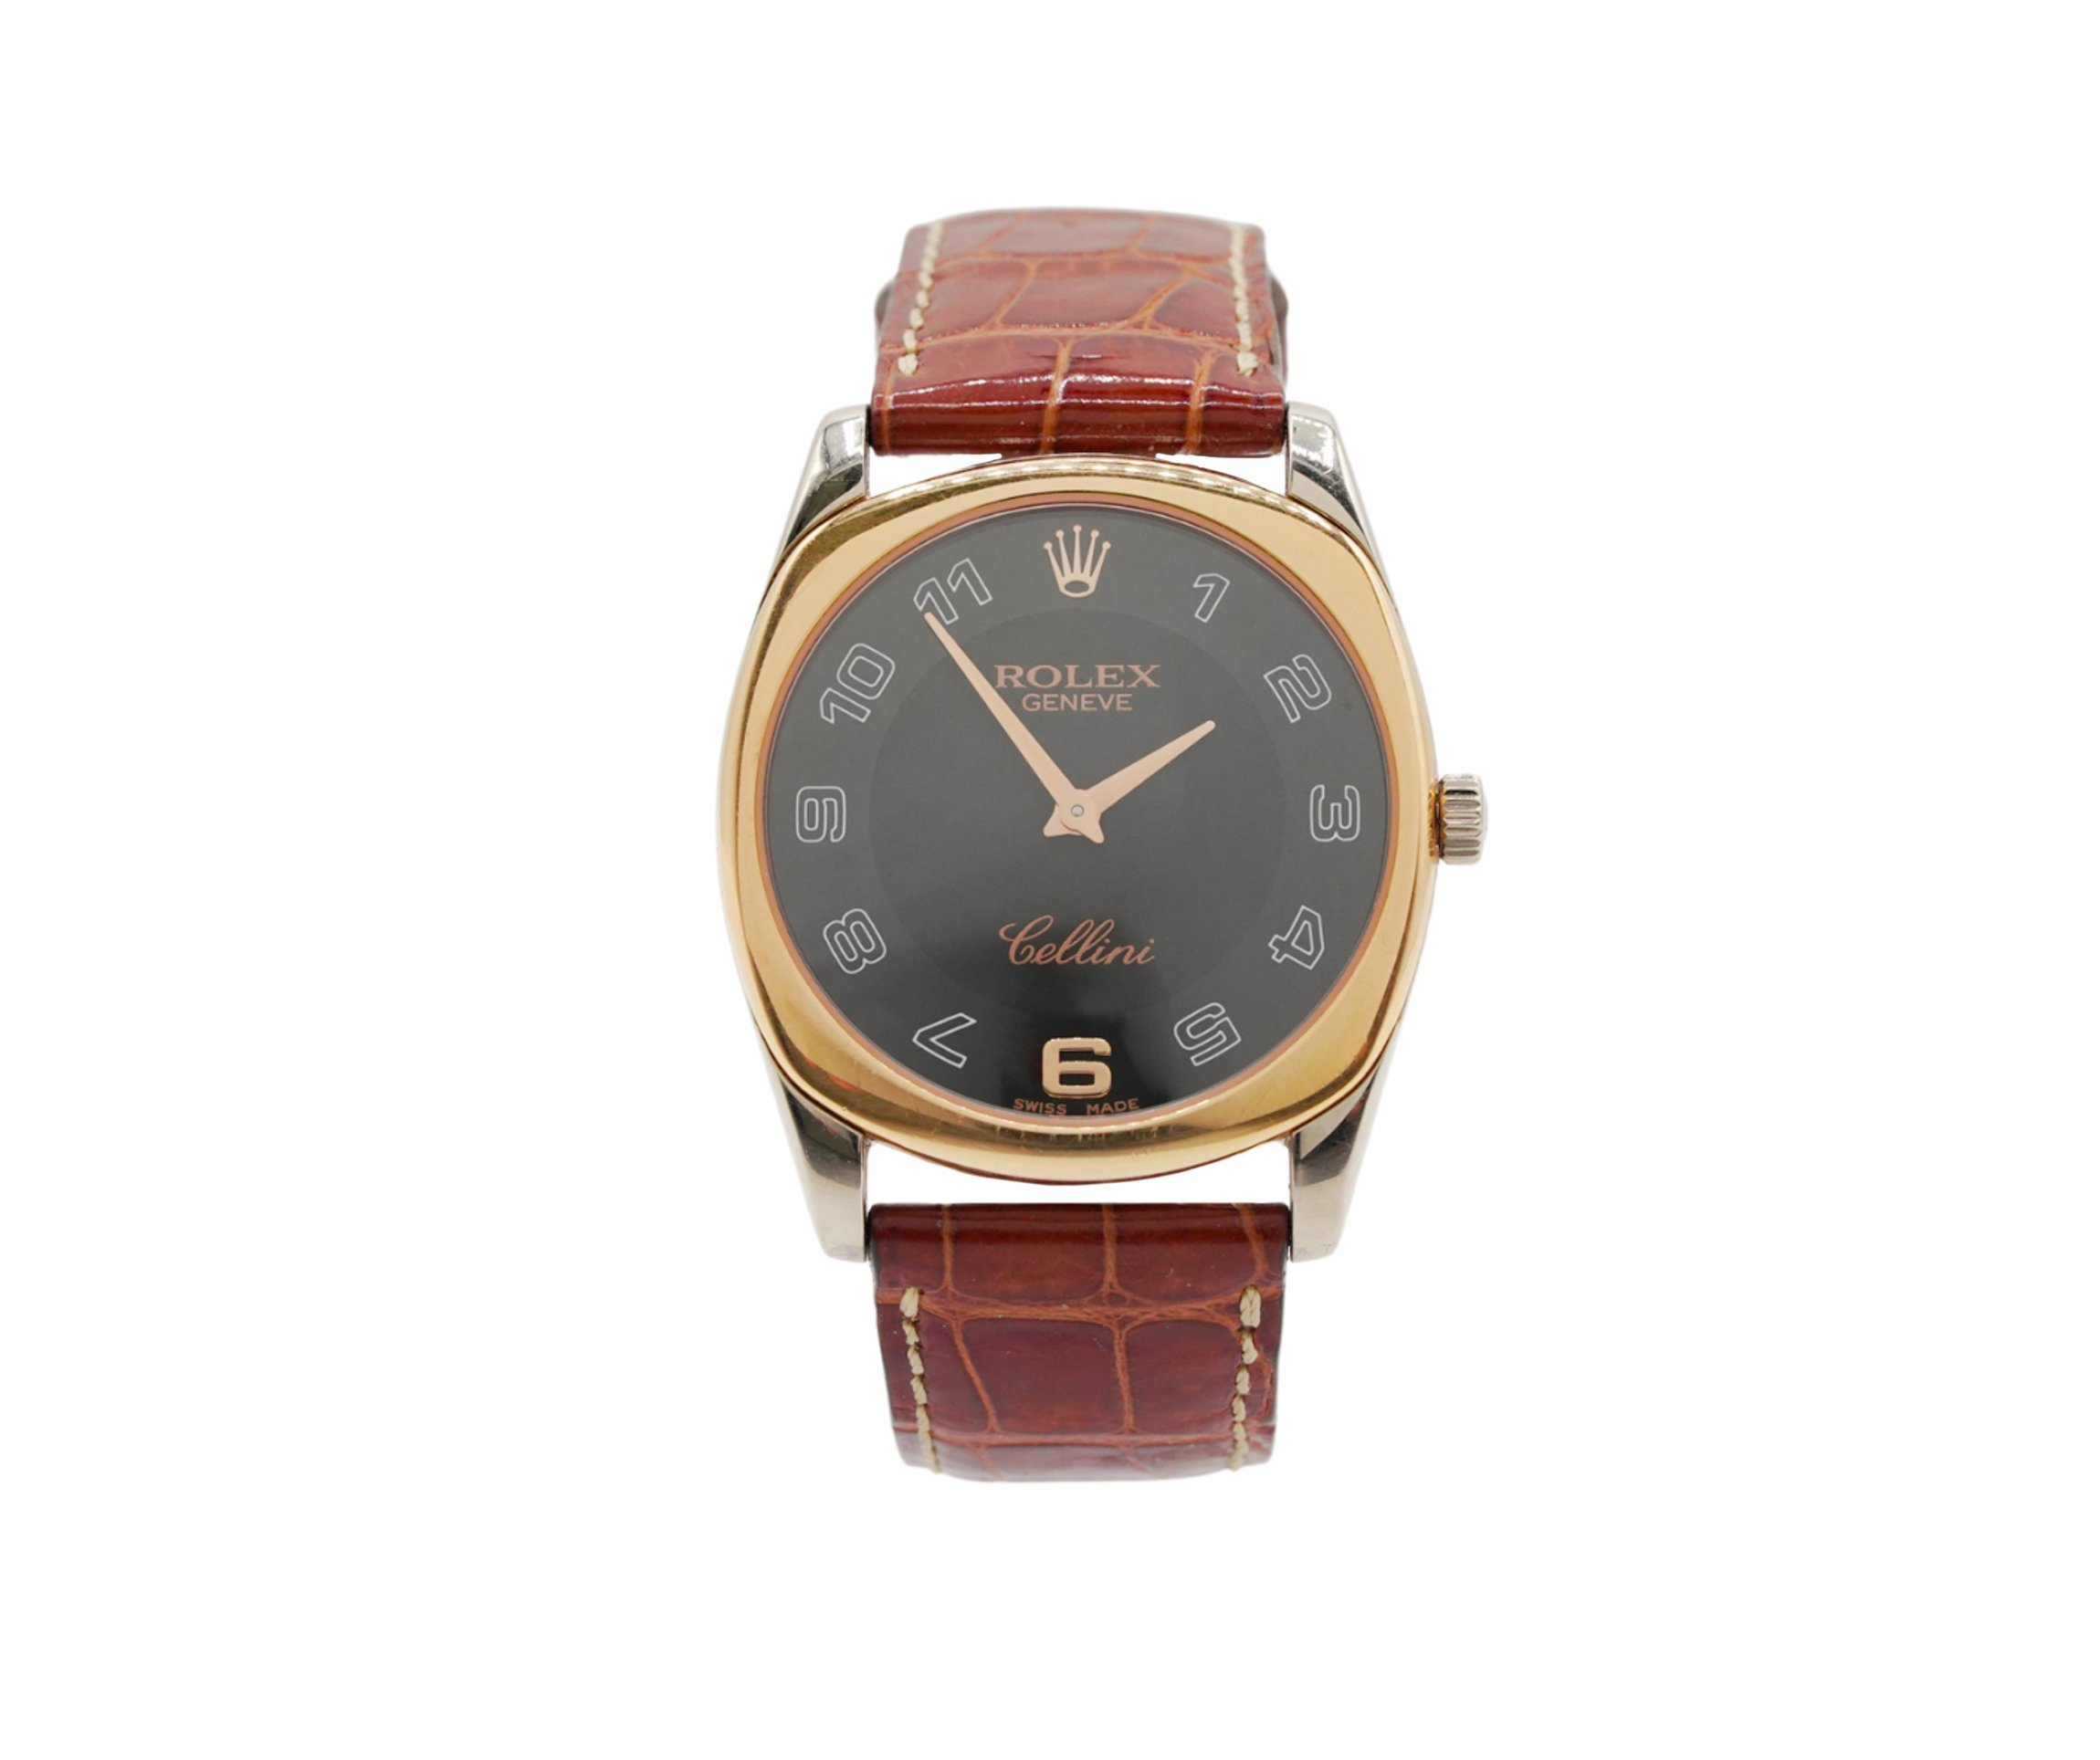 Rolex Cellini Danaos 4233 White Rose Gold Mens Watch